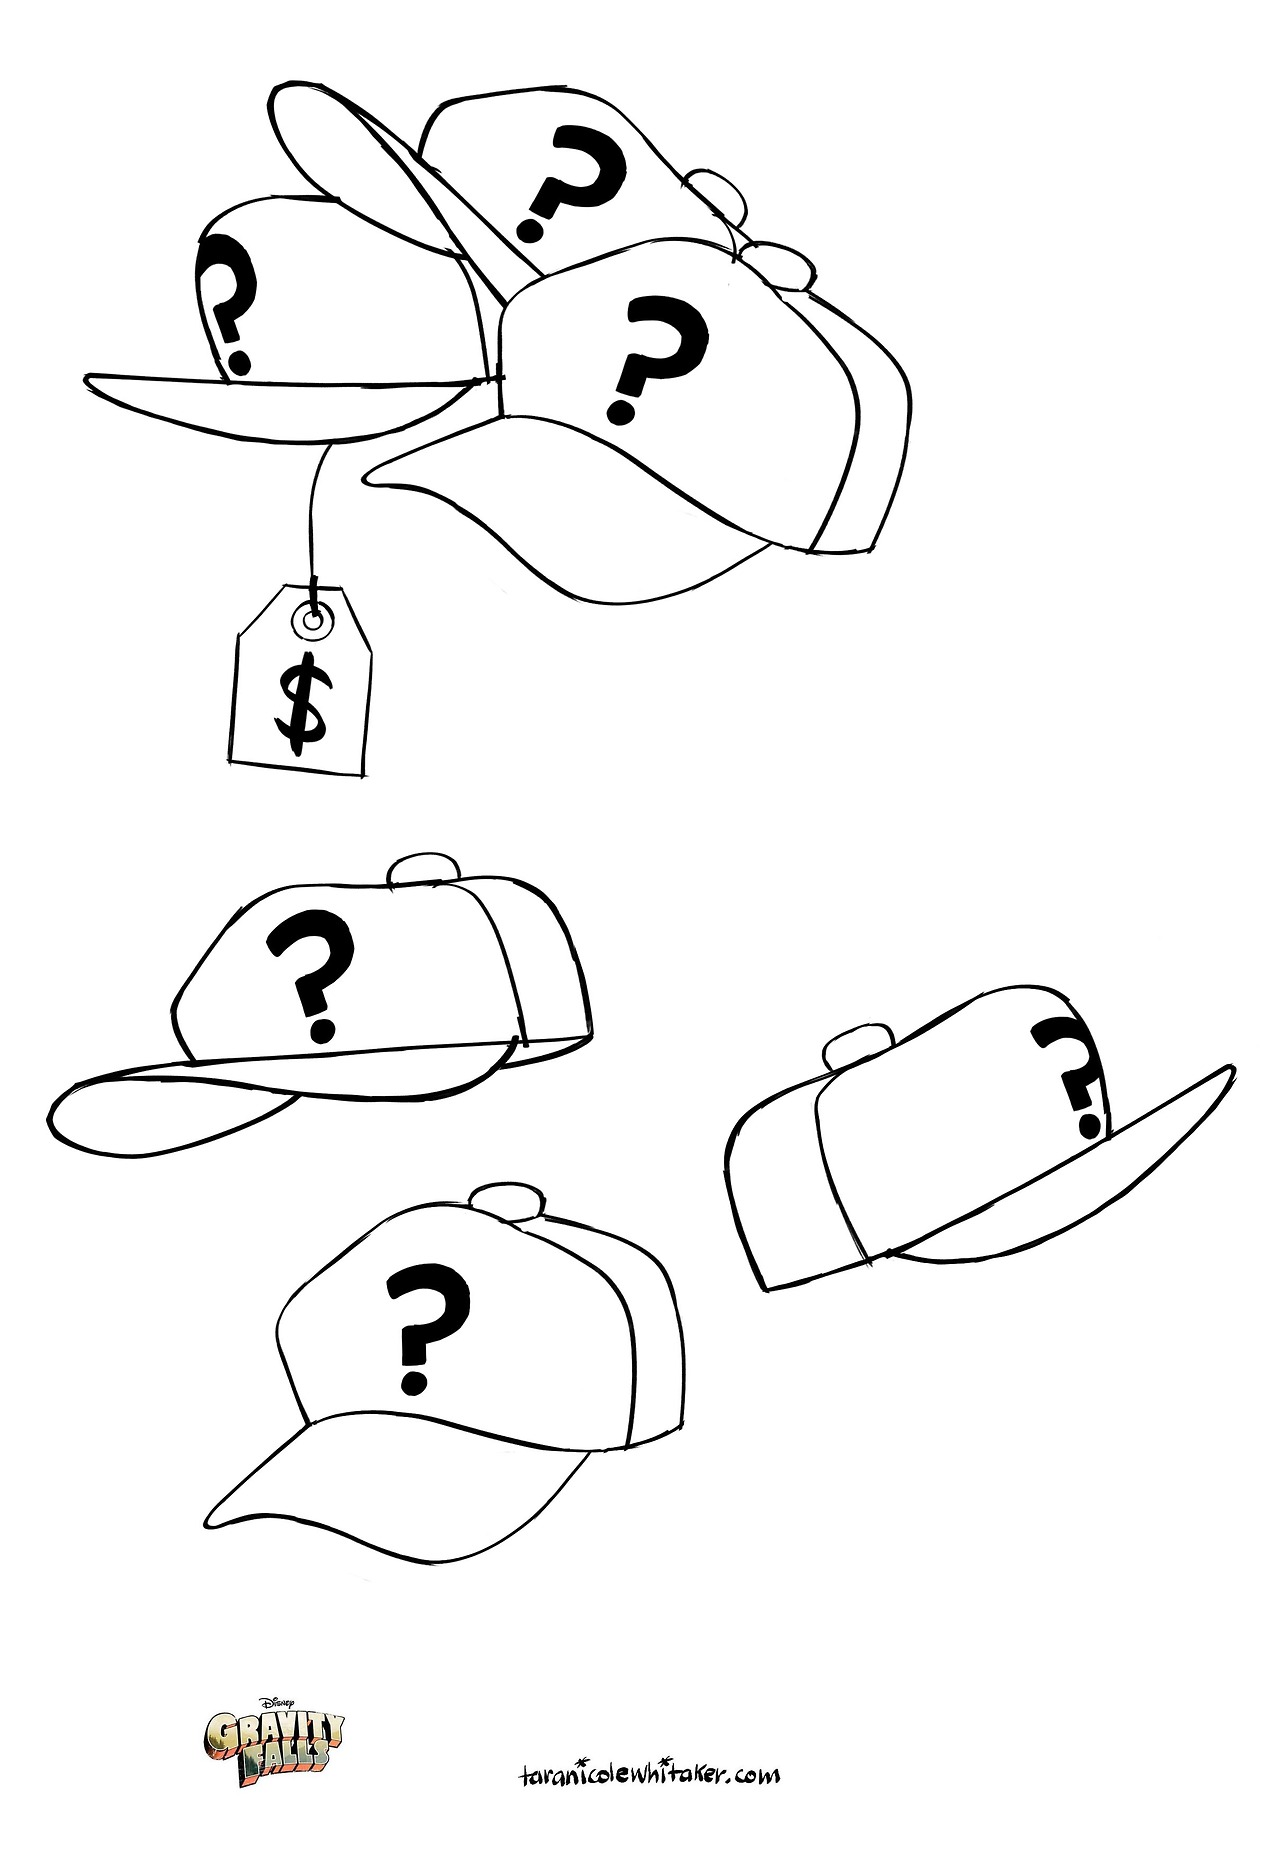 Tara_Nicole_Whitaker_props_Mystery_Shack_hats.jpg